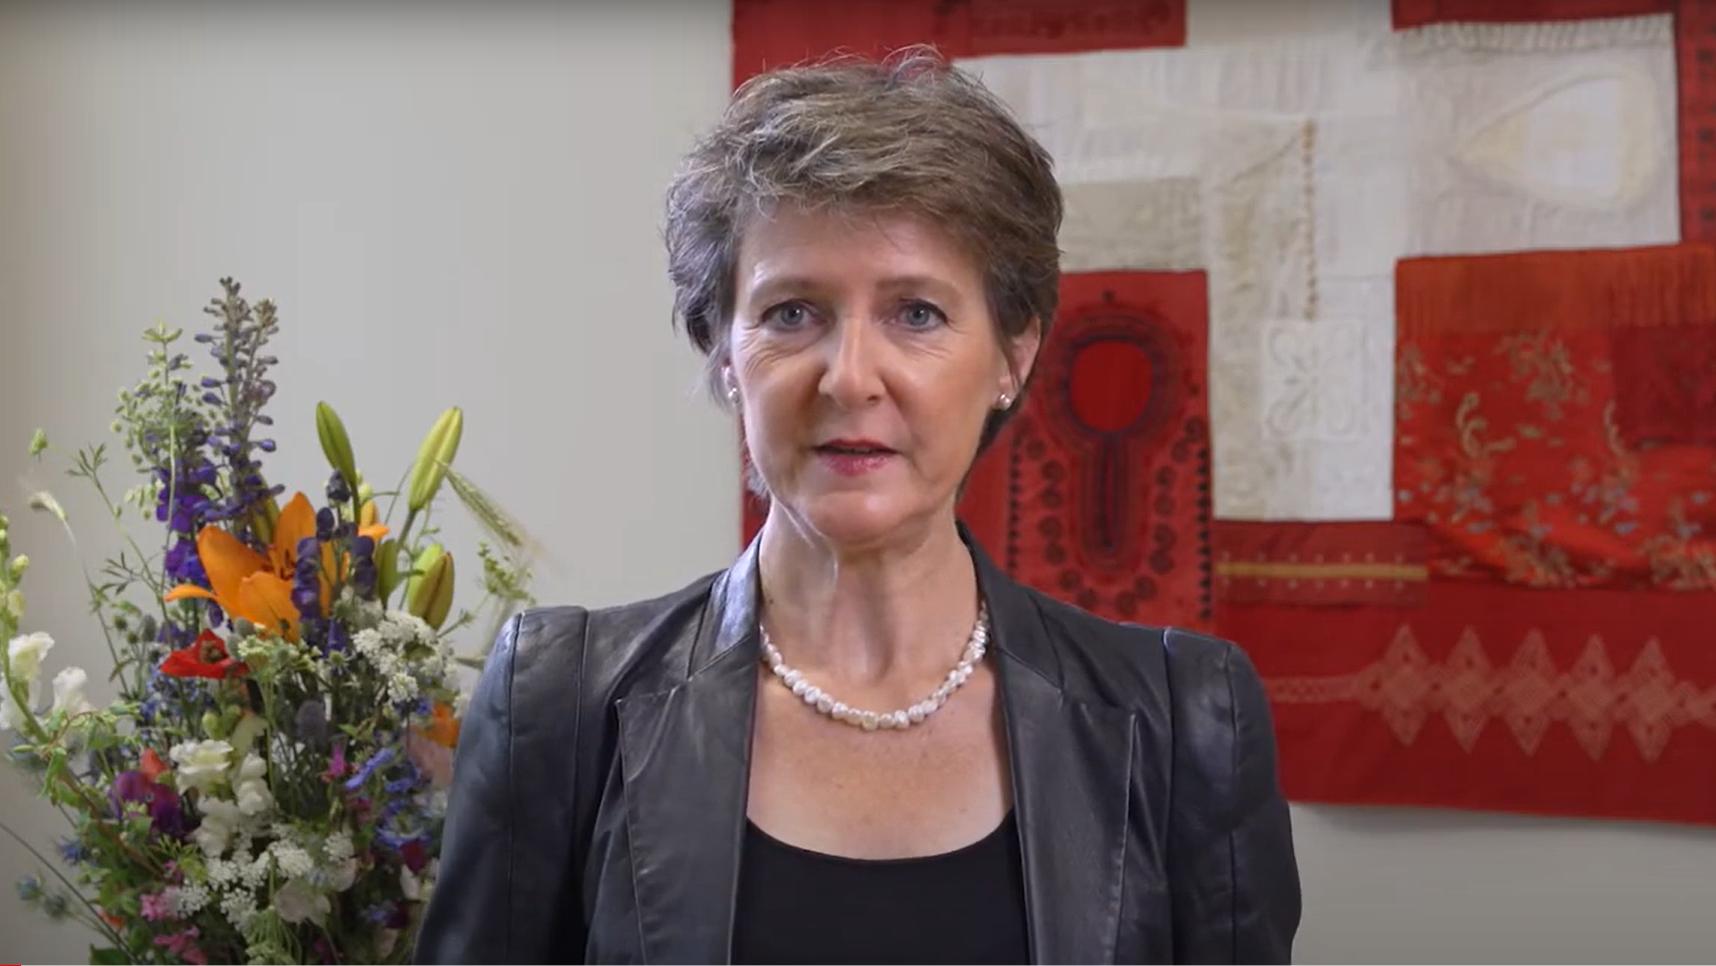 Simonetta Sommaruga gedachte den Opfern des Srebrenica-Massakers.